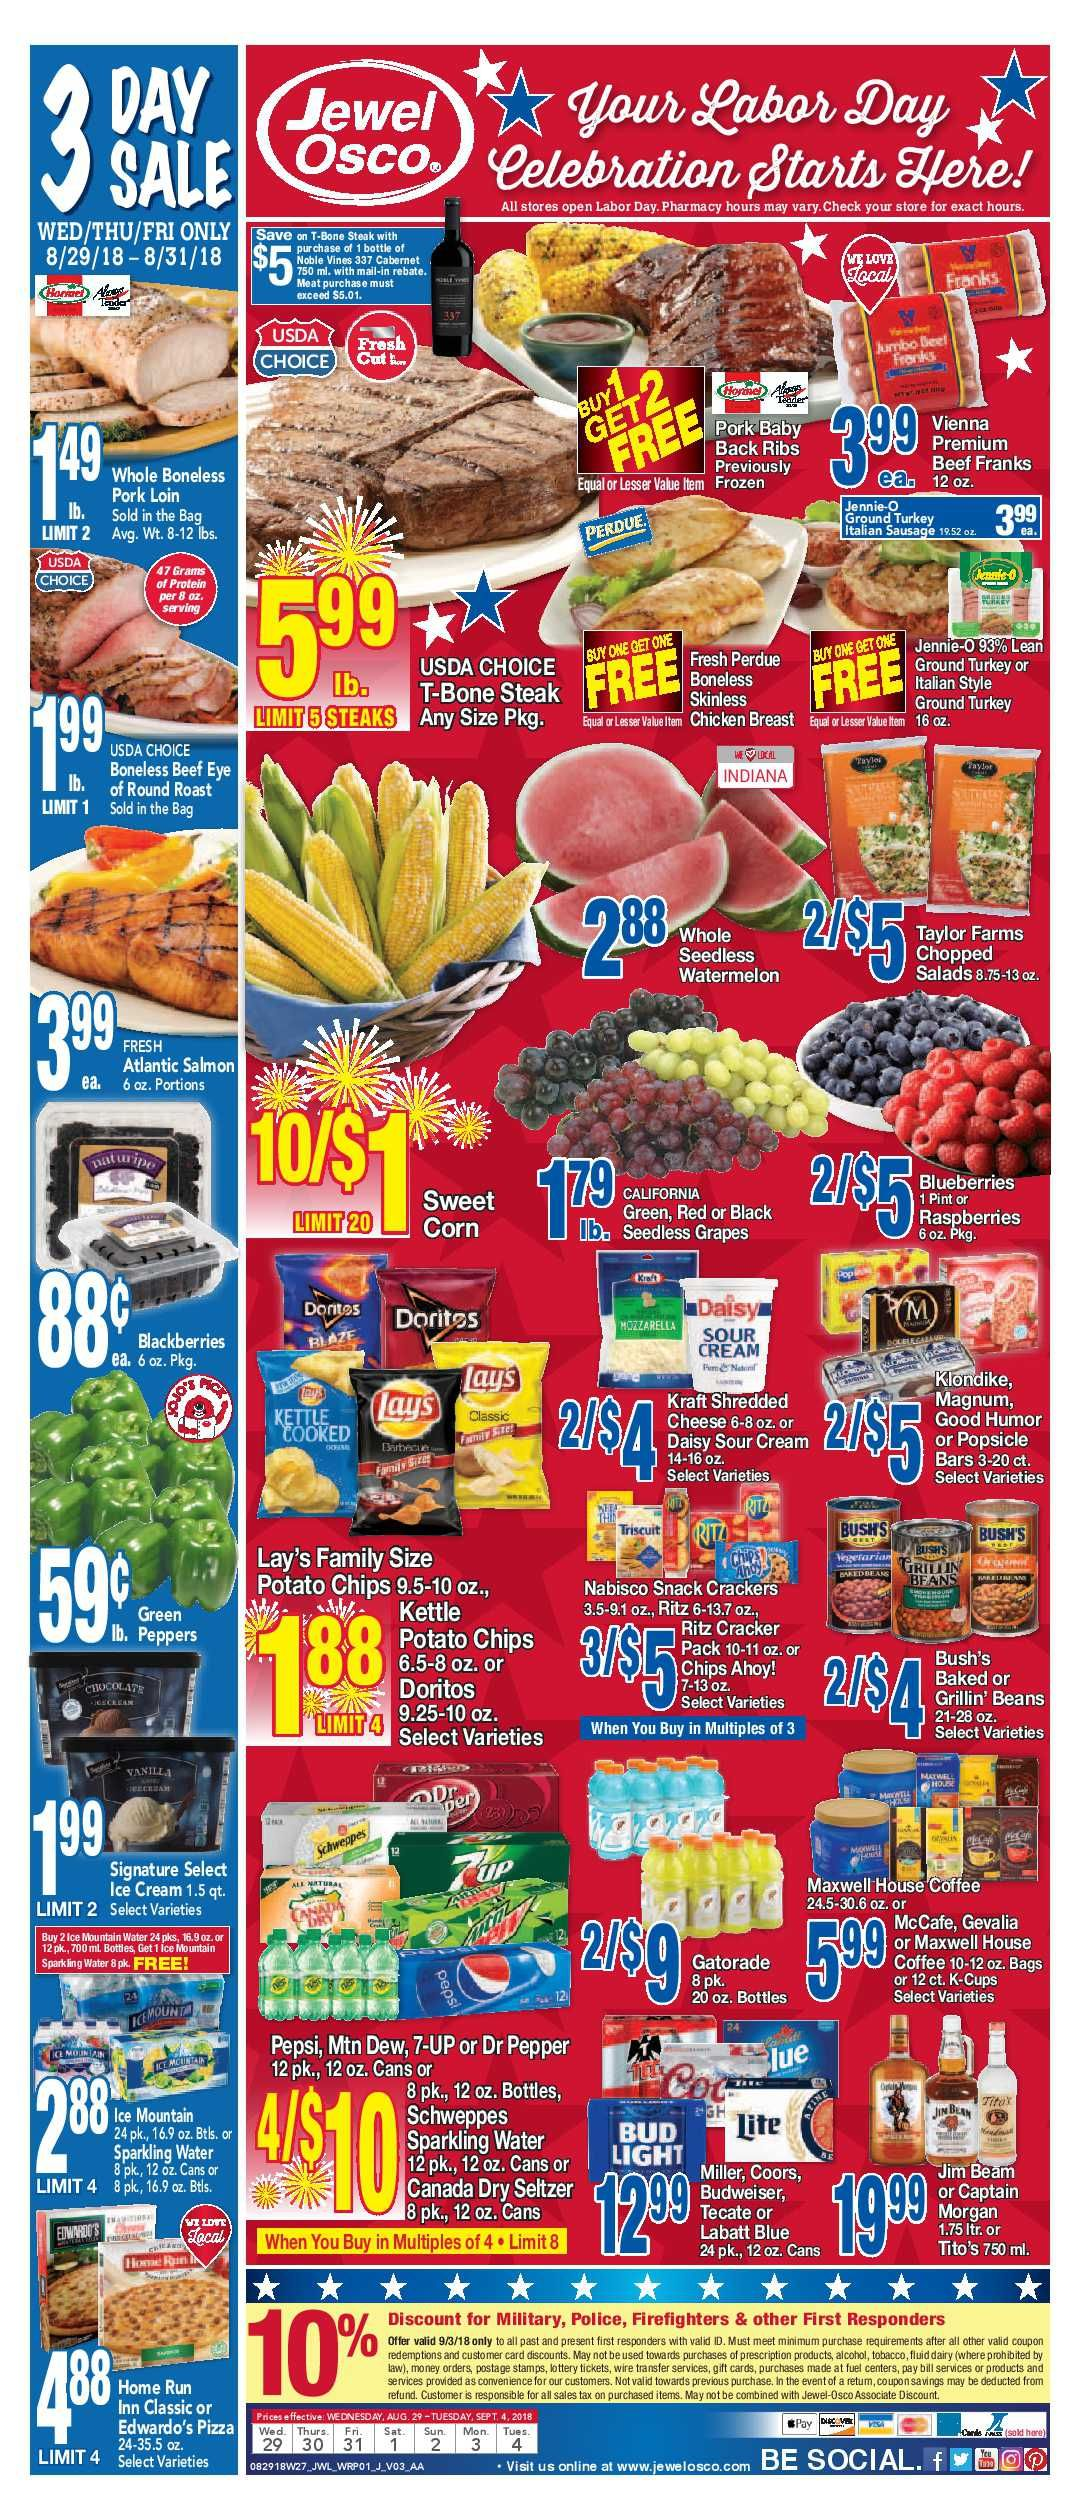 Jewel Osco Weekly Ad Flyer 5 19 21 5 25 21 Weeklyad123 Com Weekly Ads Grocery Savings Flyer